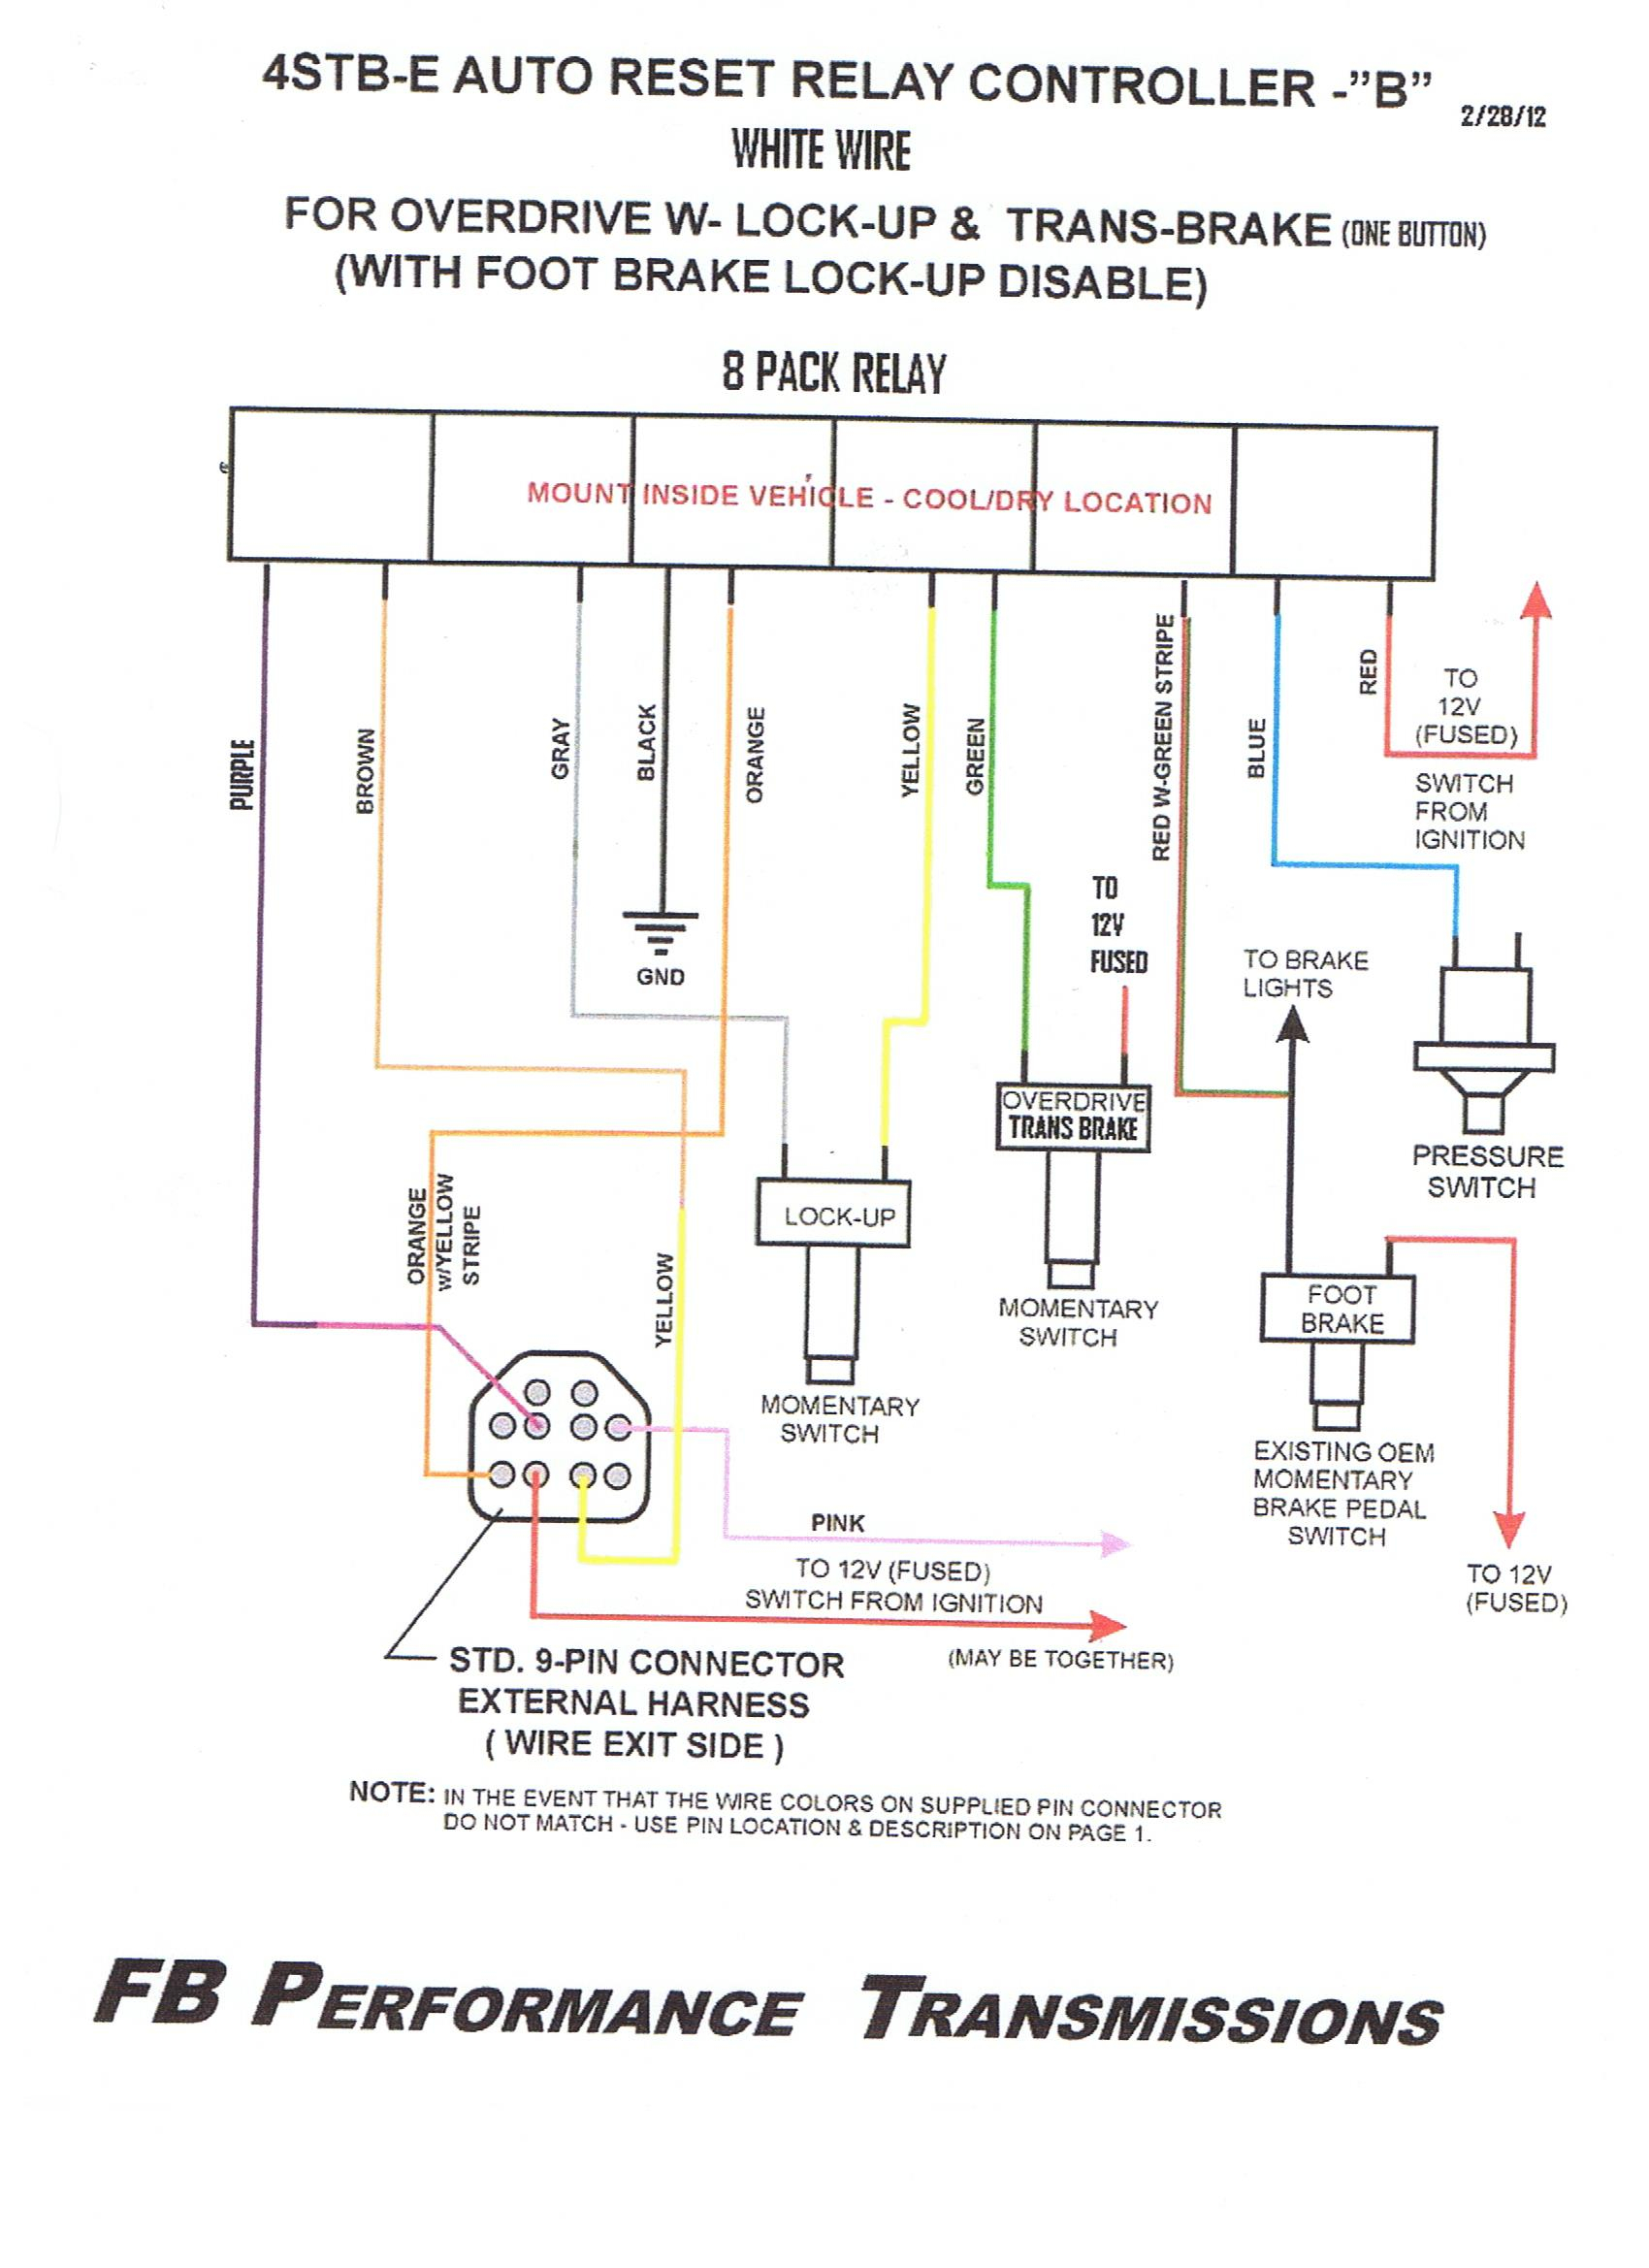 8 parking sensor wiring diagram Download-WIRING and Operation 9 pin Feb 2012 11-i